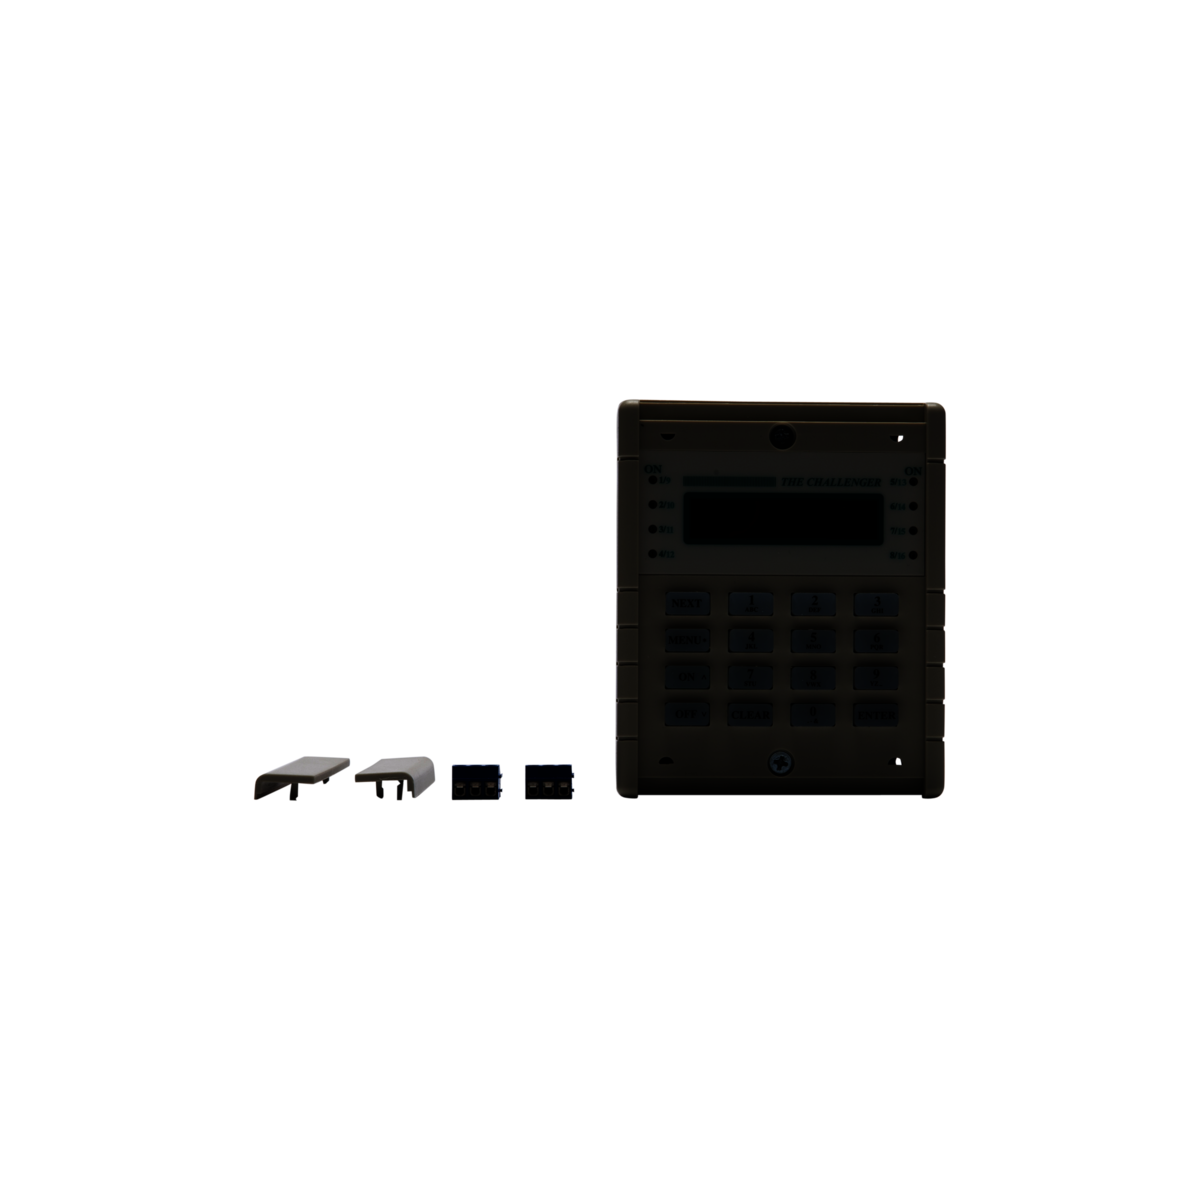 S5001_1